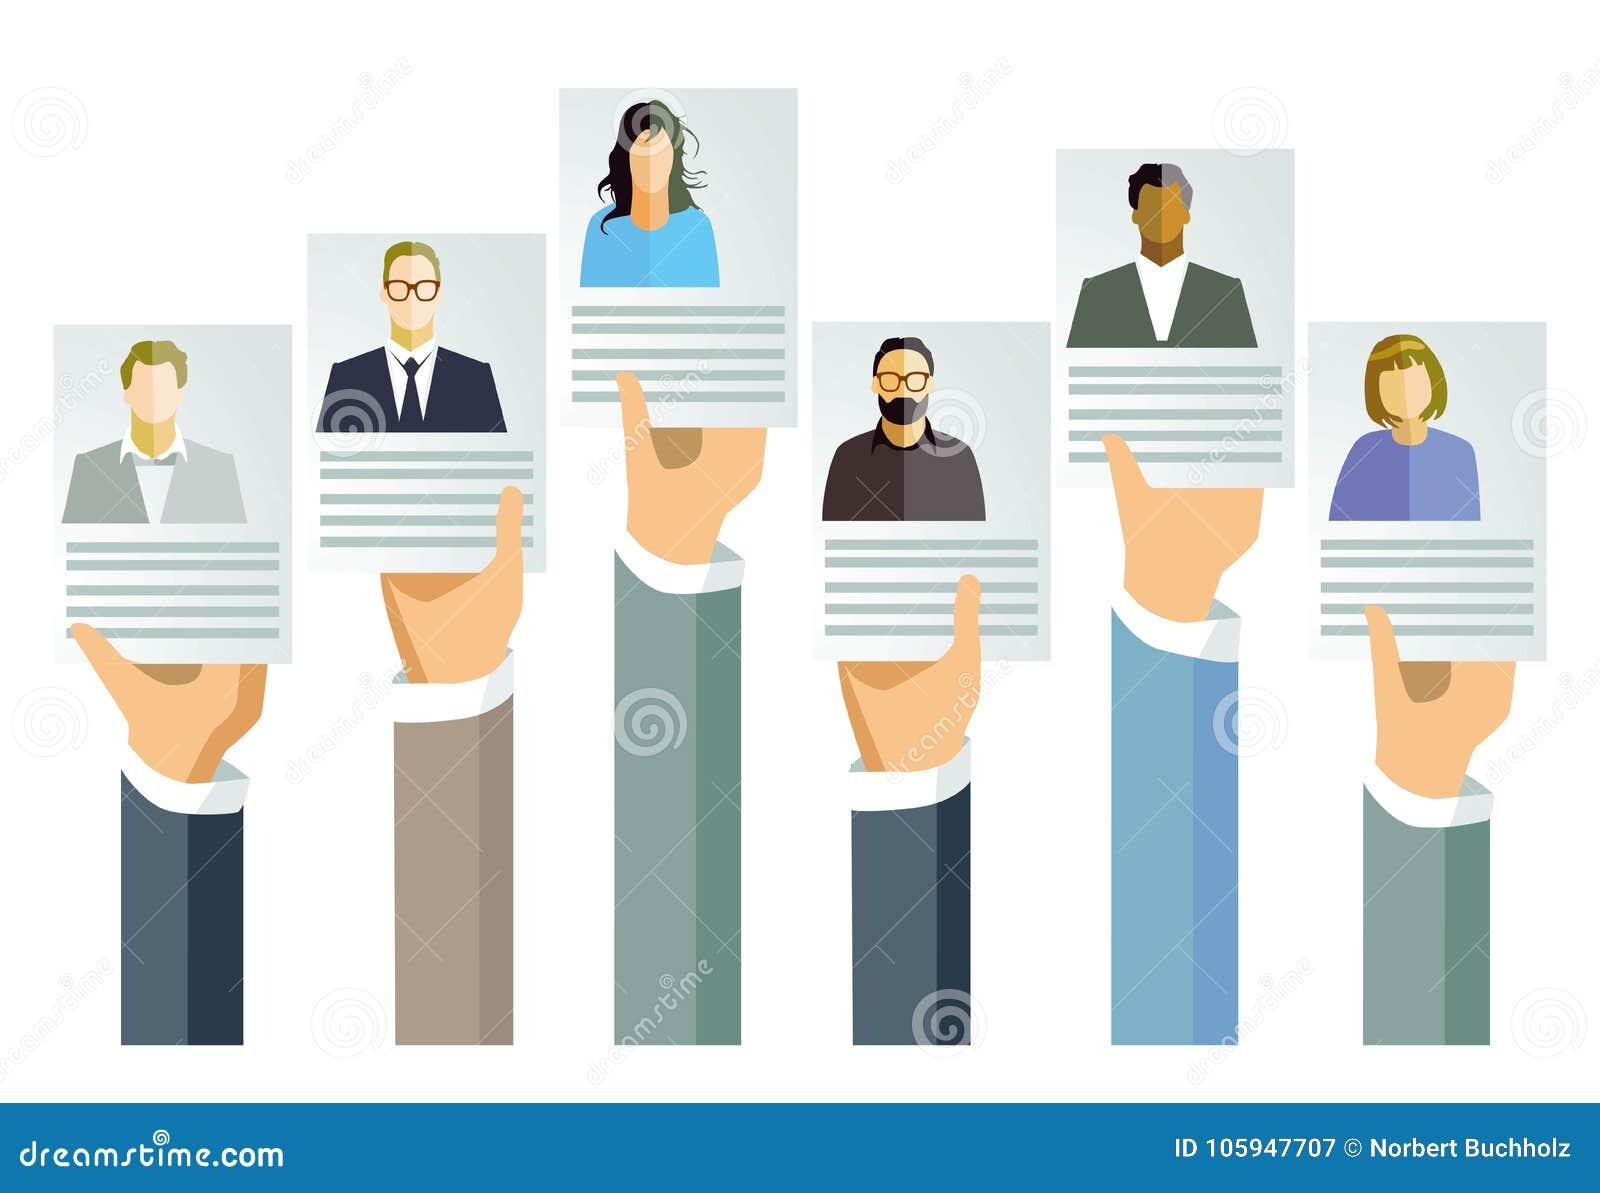 Toepassing voor baan en aanbieding